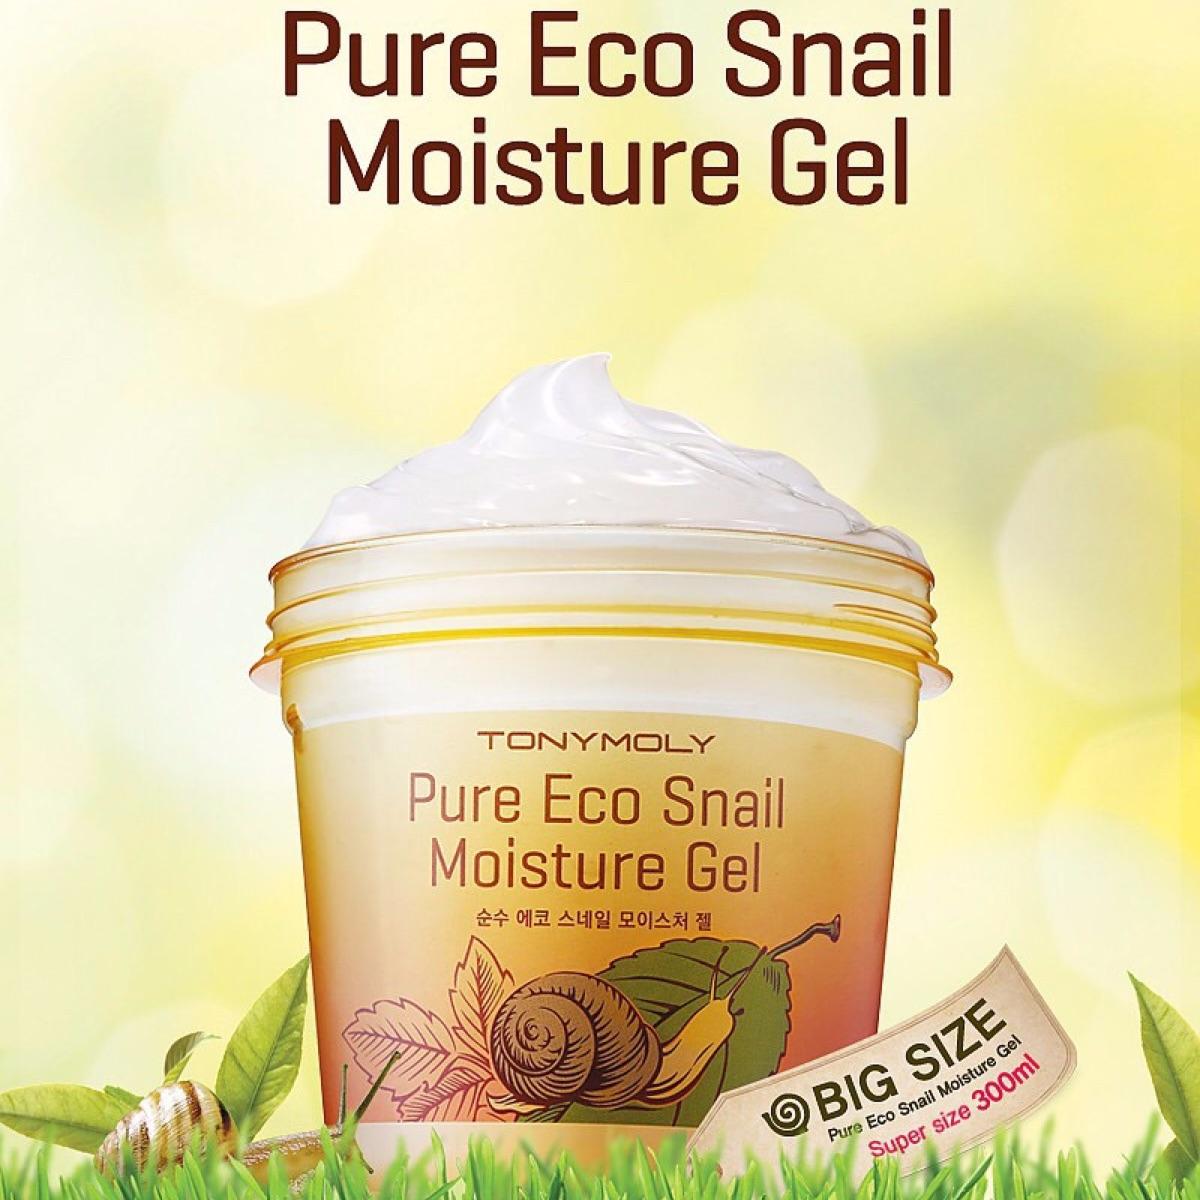 TONYMOLY - Pure Eco Snail Moisture Gel